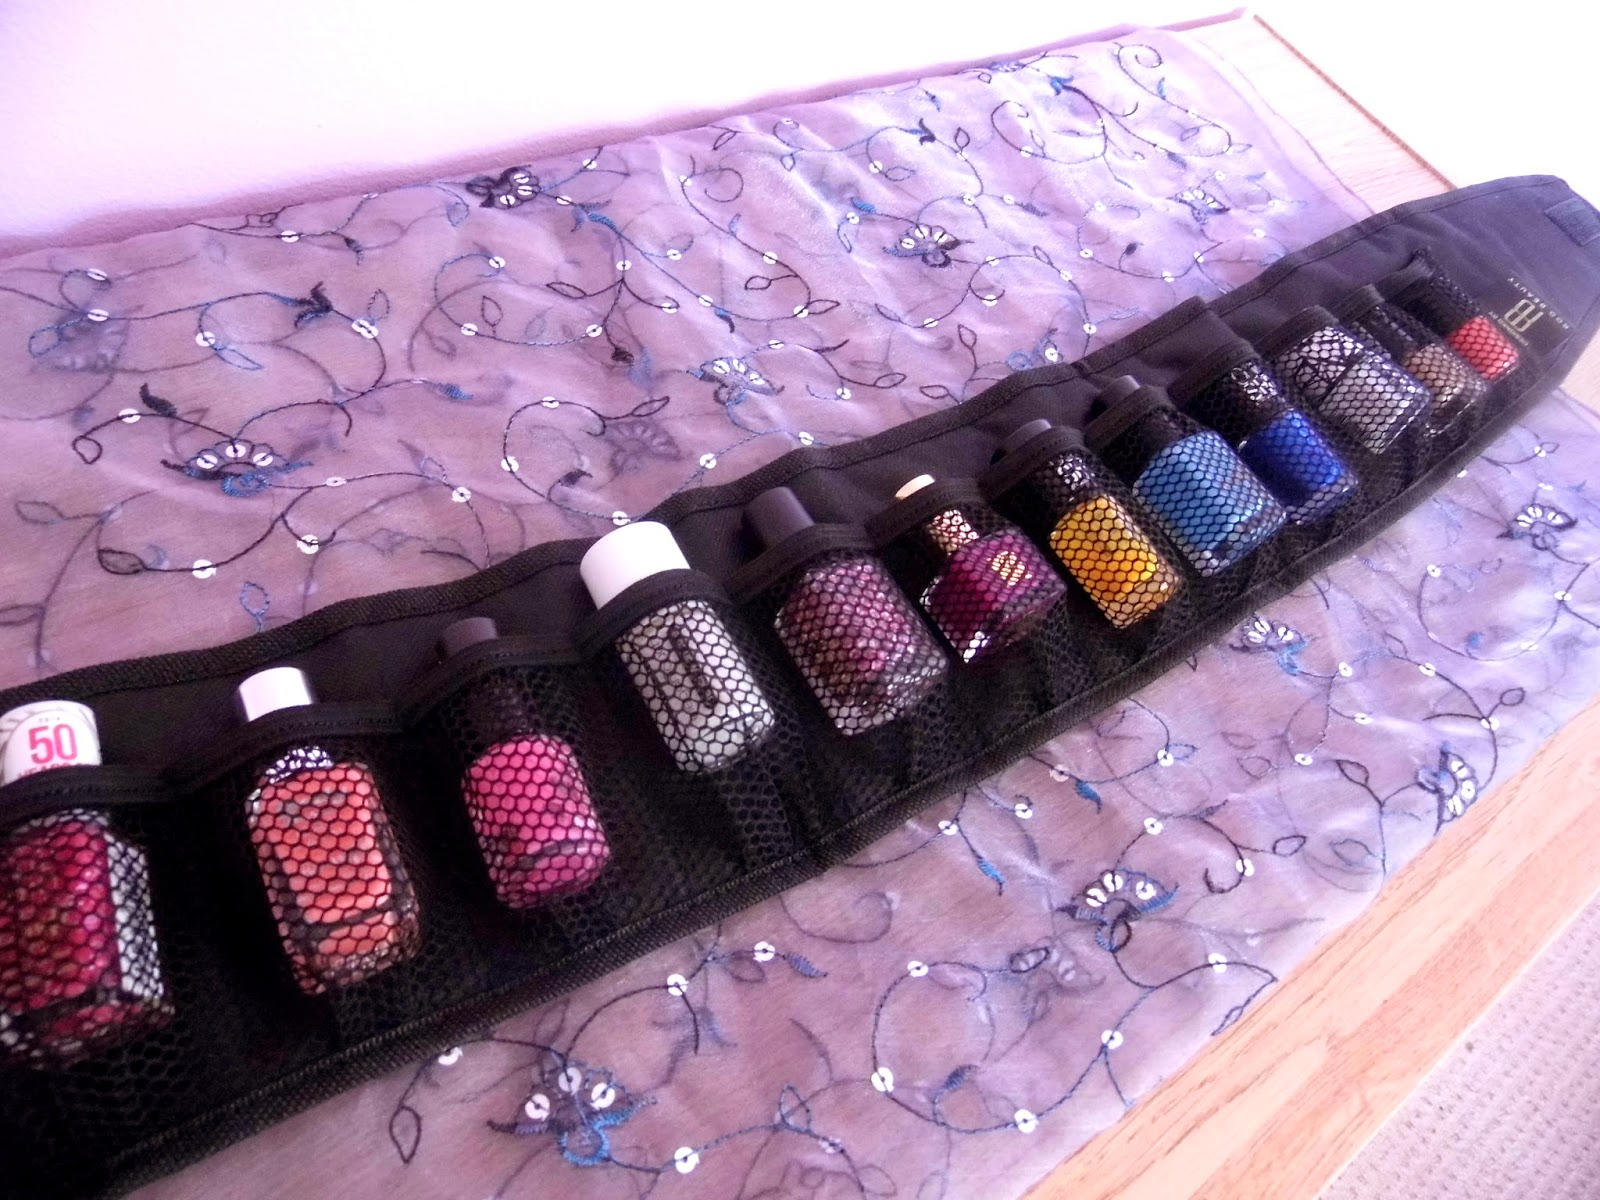 Roo Beauty Nail Polish Rolls | DollfaceBlogs